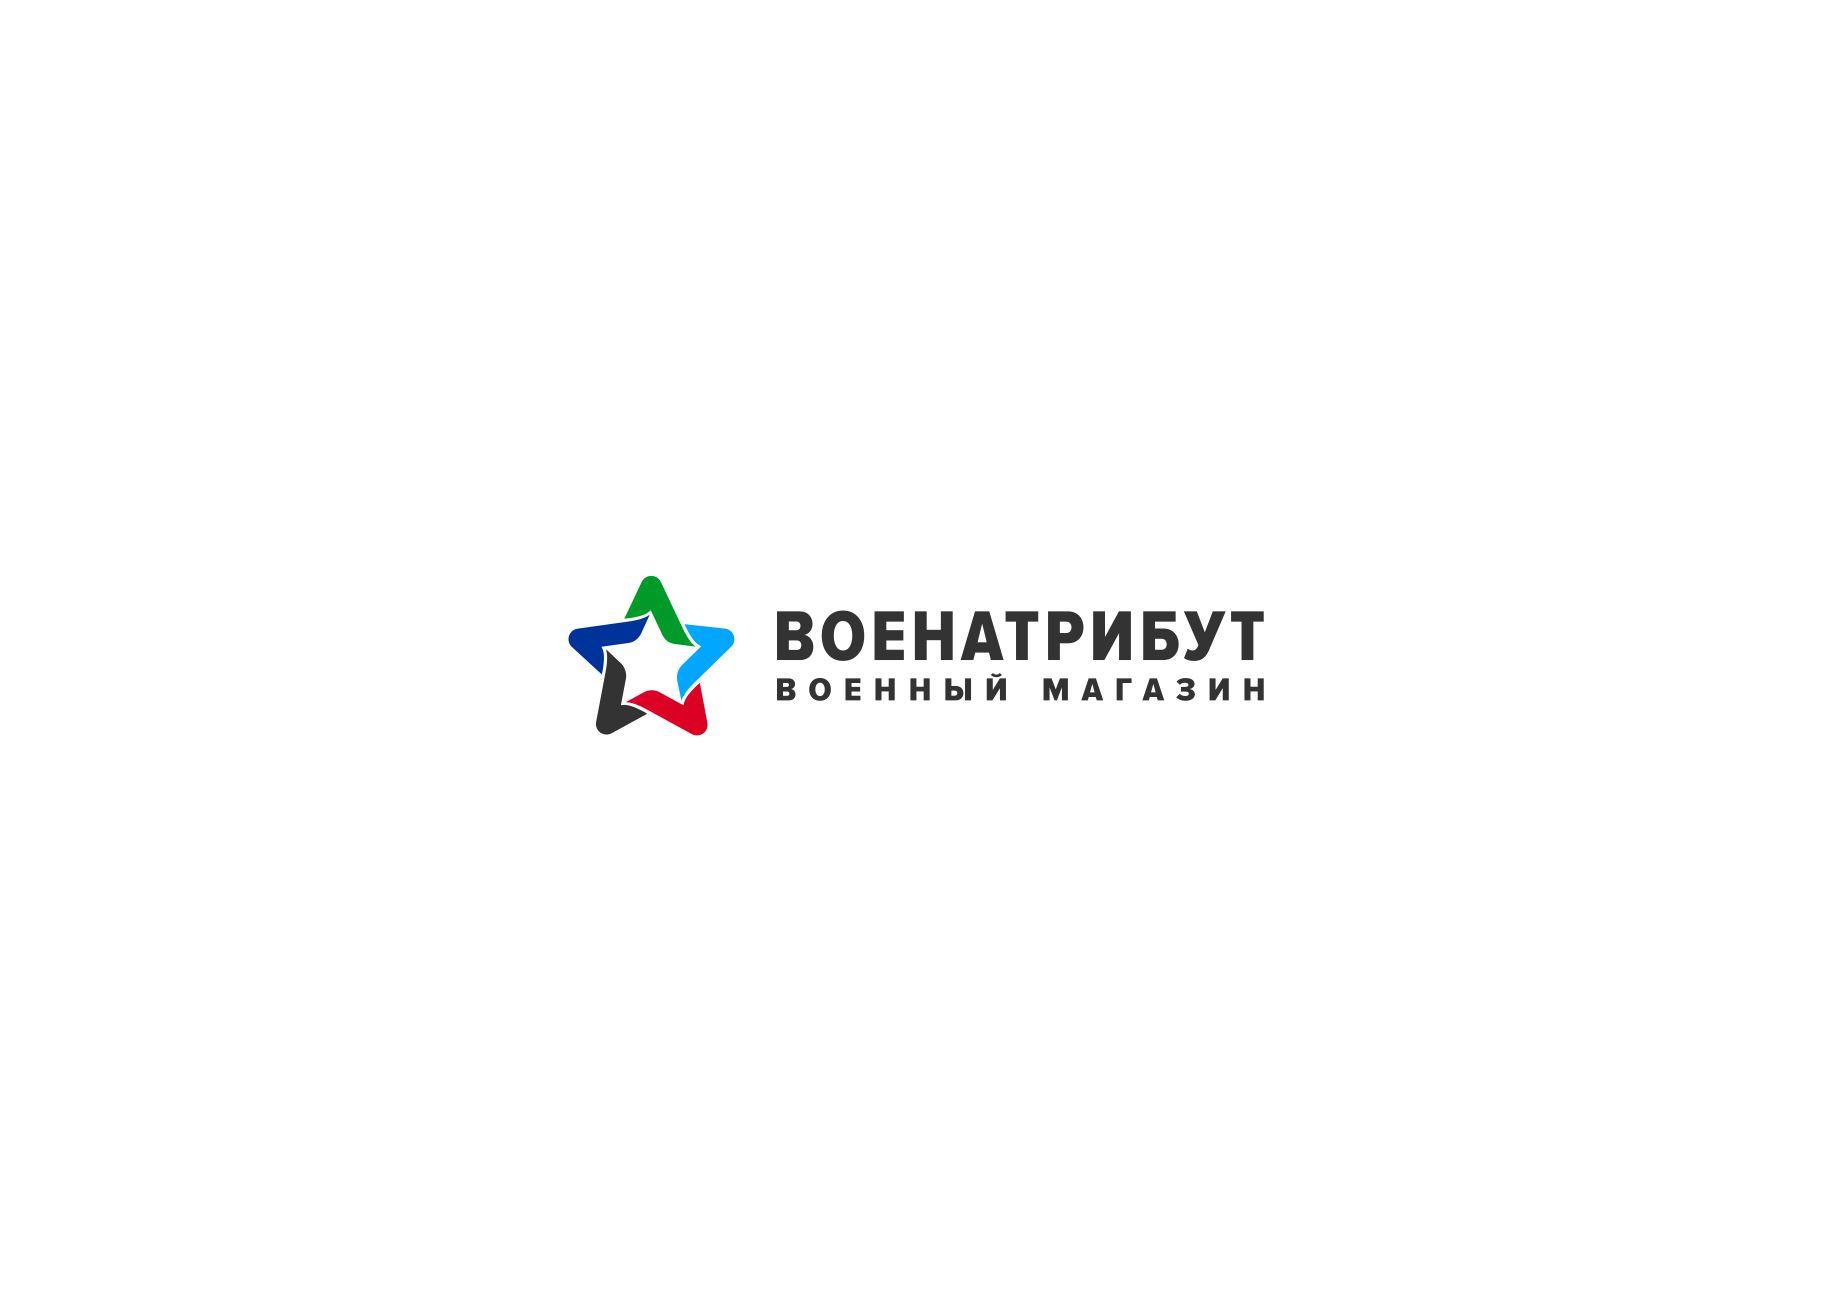 Разработка логотипа для компании военной тематики фото f_116601ae9fe60323.jpg